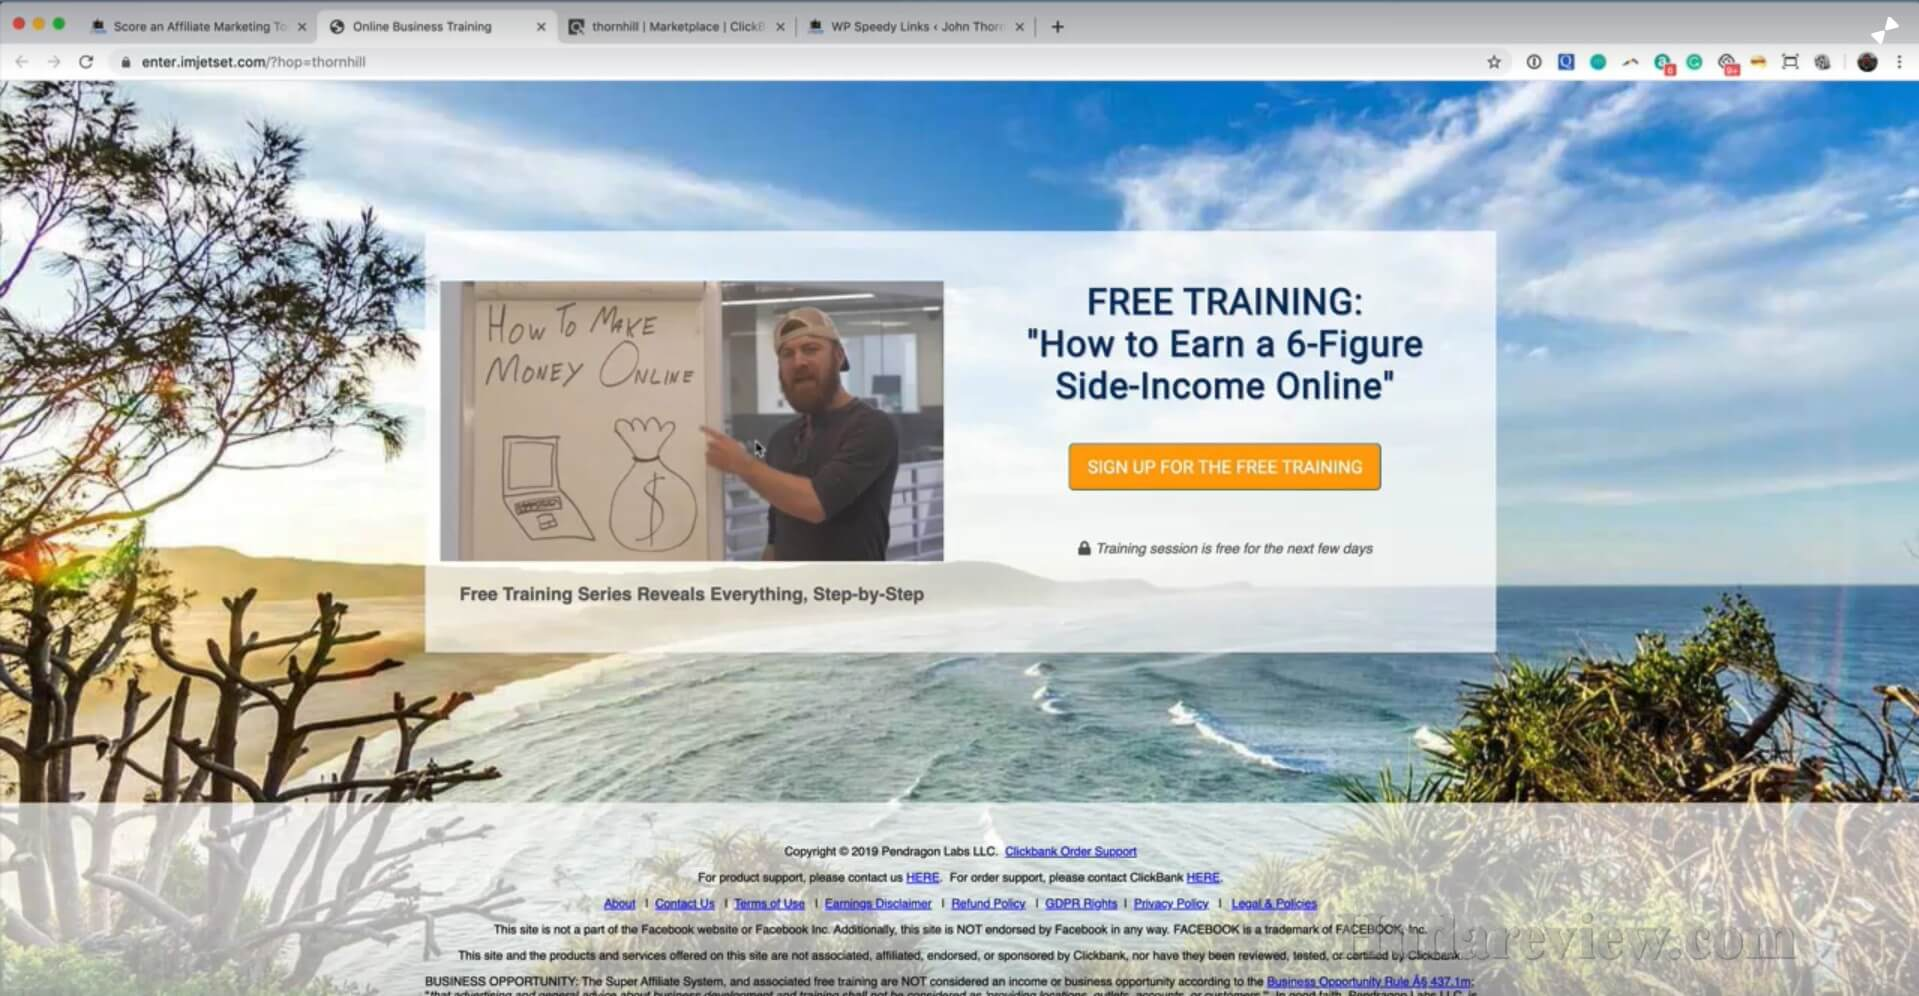 WP-Speedy-Links-Review-Step-3-2